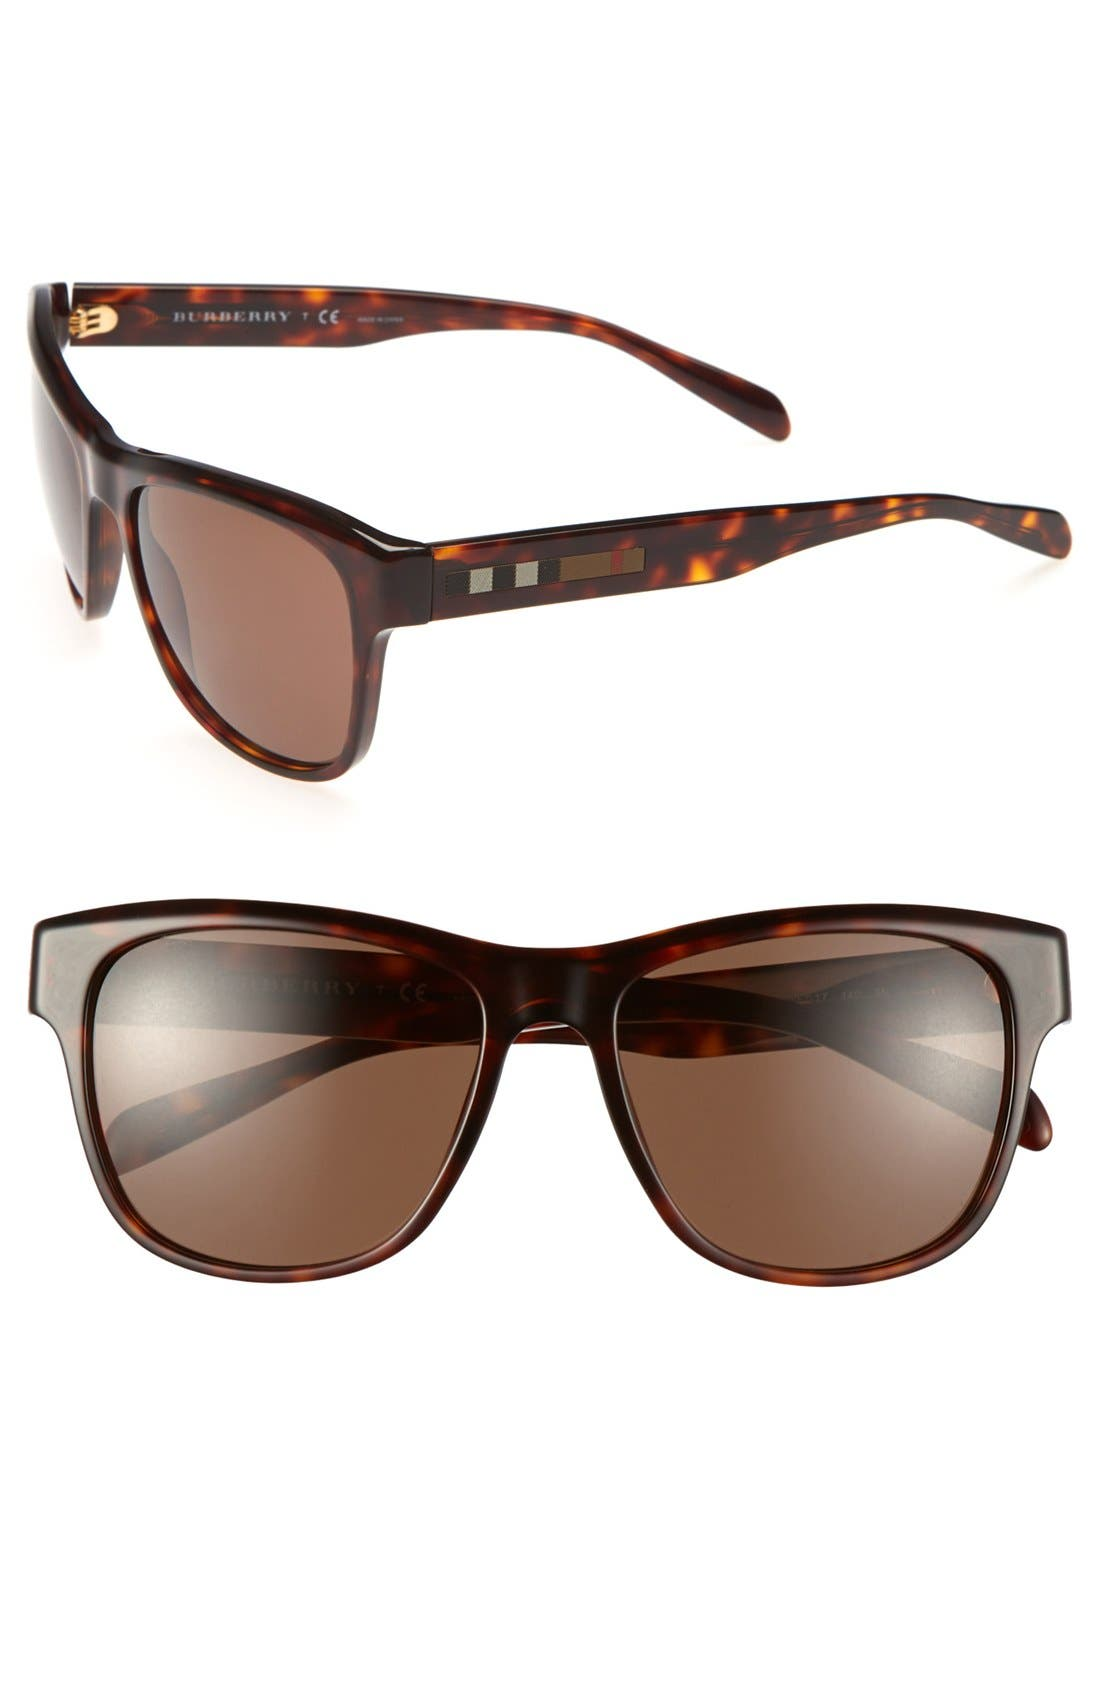 Main Image - Burberry 56mm Retro Sunglasses